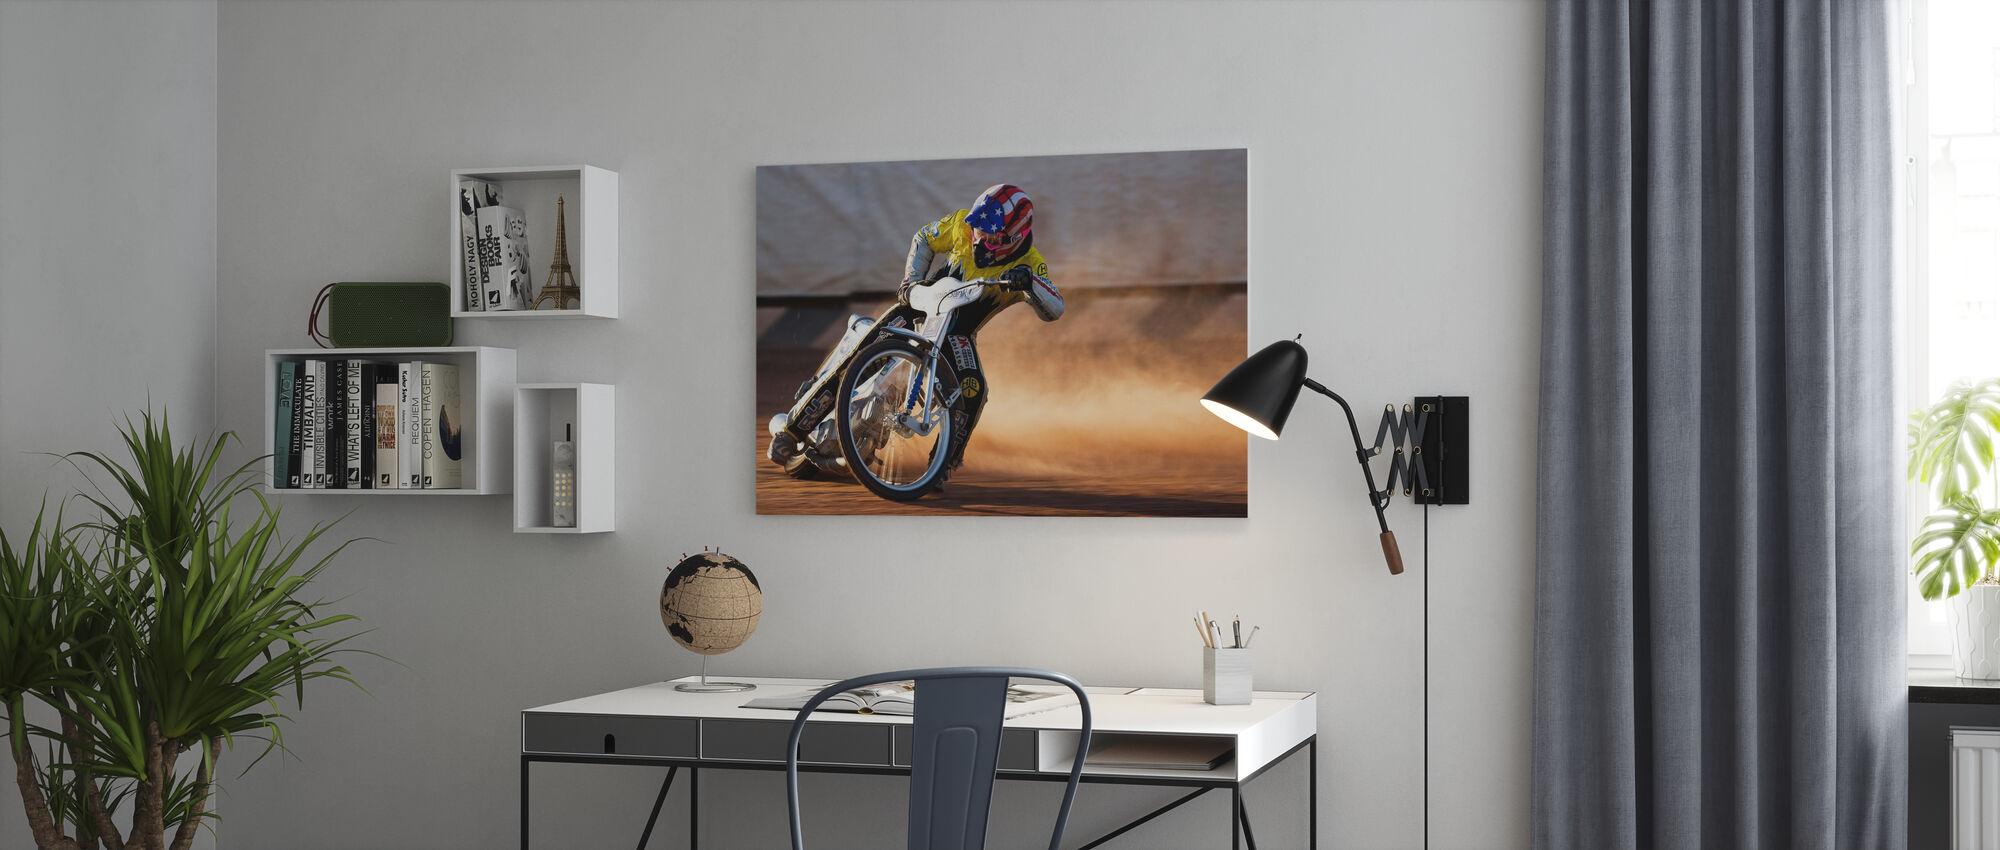 Going Sideways - Canvas print - Office